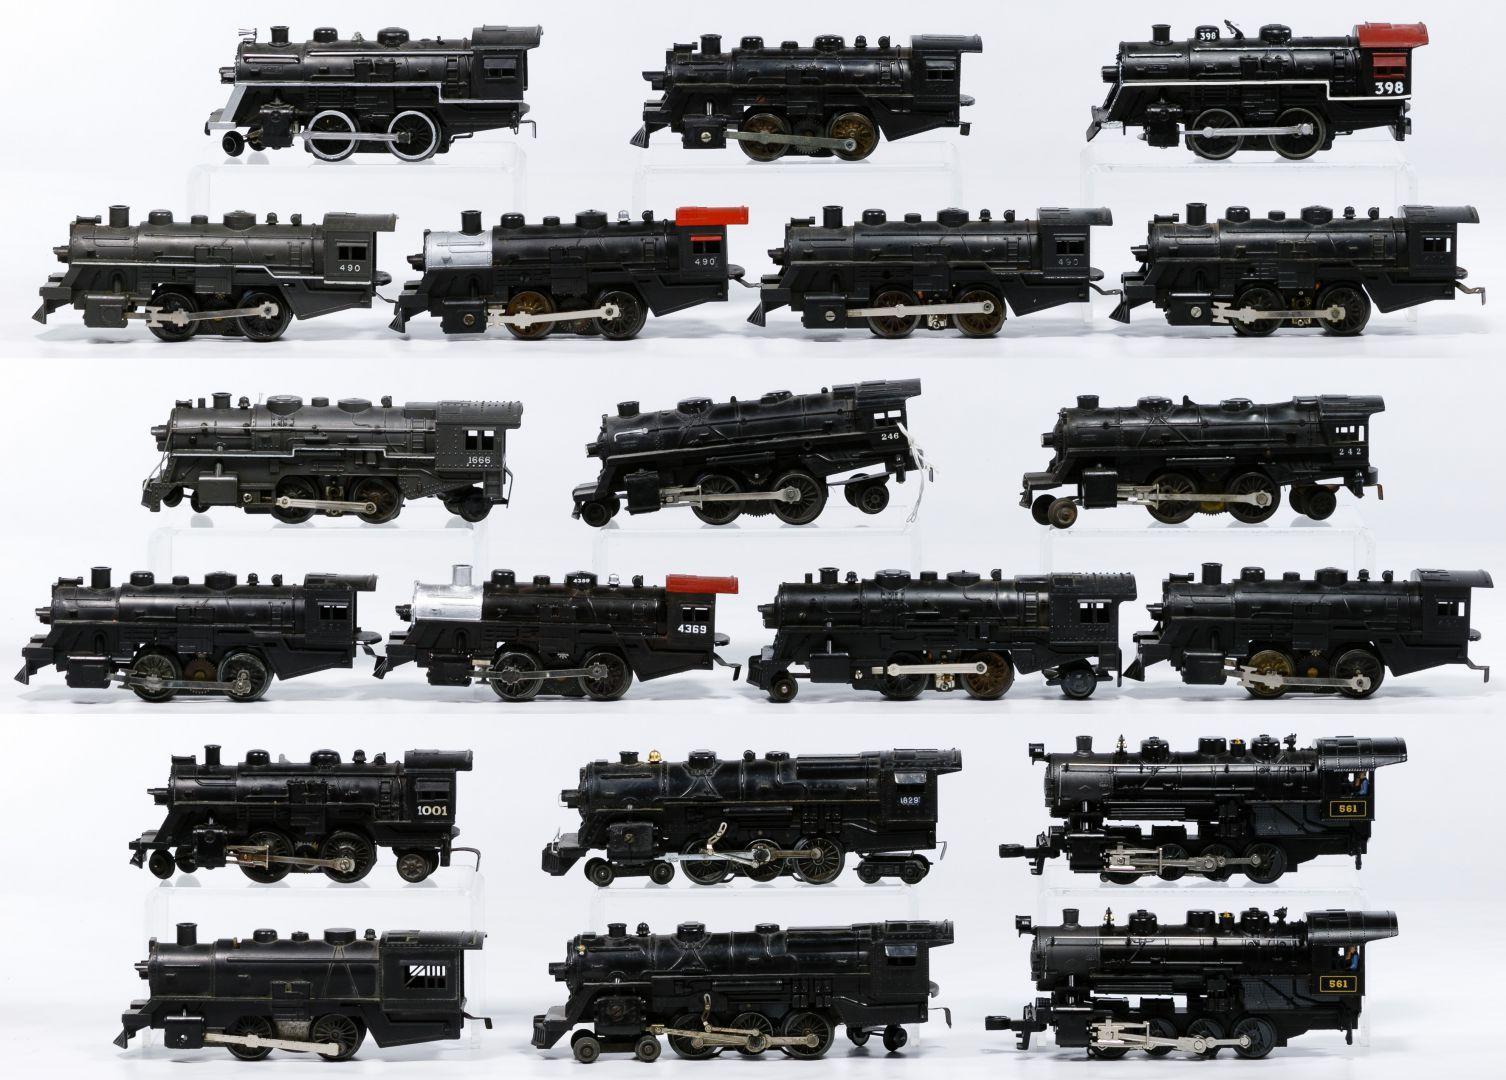 Lot 233 Lionel Model Train Engine Assortment Twenty Post War Engines Including 490 398 4369 561 246 And 1666 Model Trains Train Locomotive